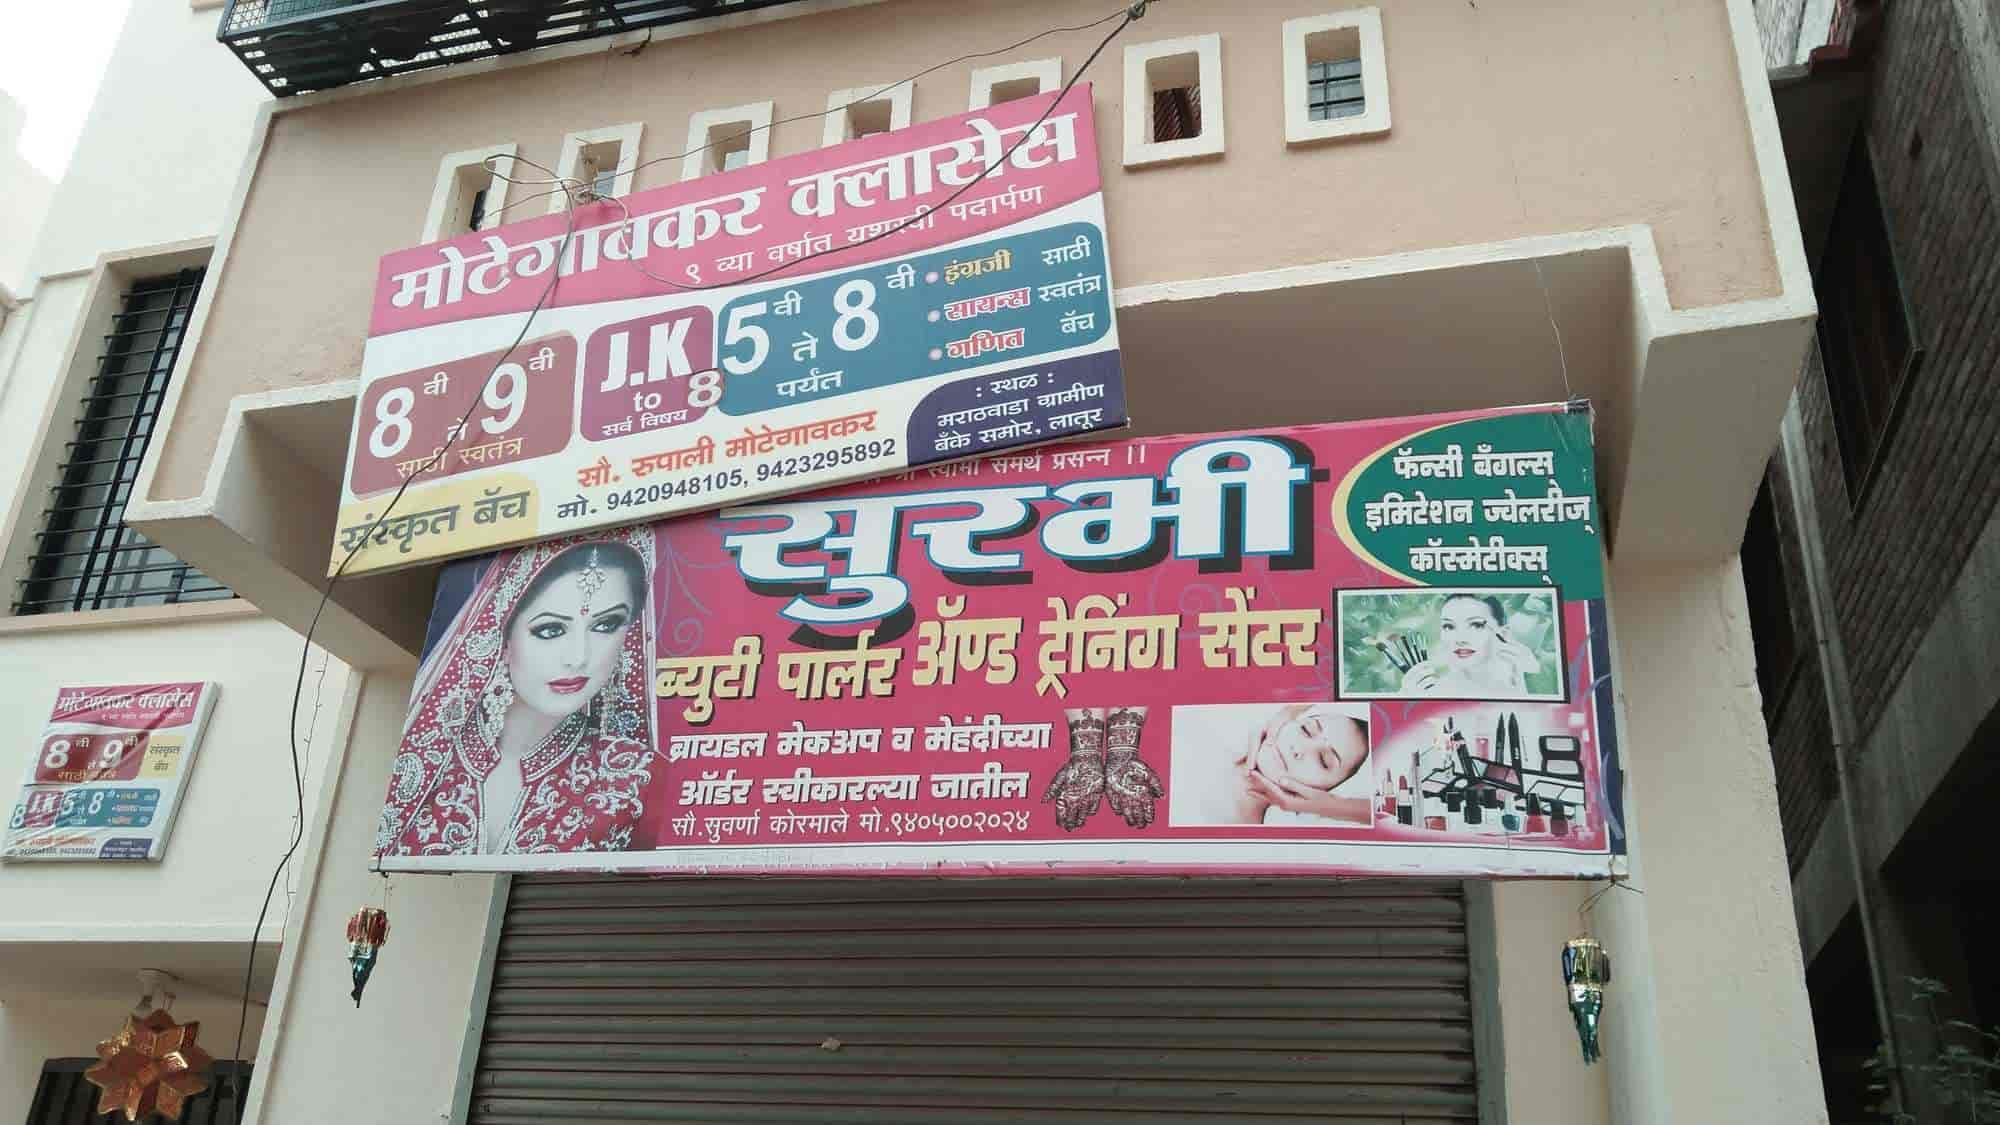 Motegaonkar Classes Photos, Ausa Road, Latur- Pictures & Images